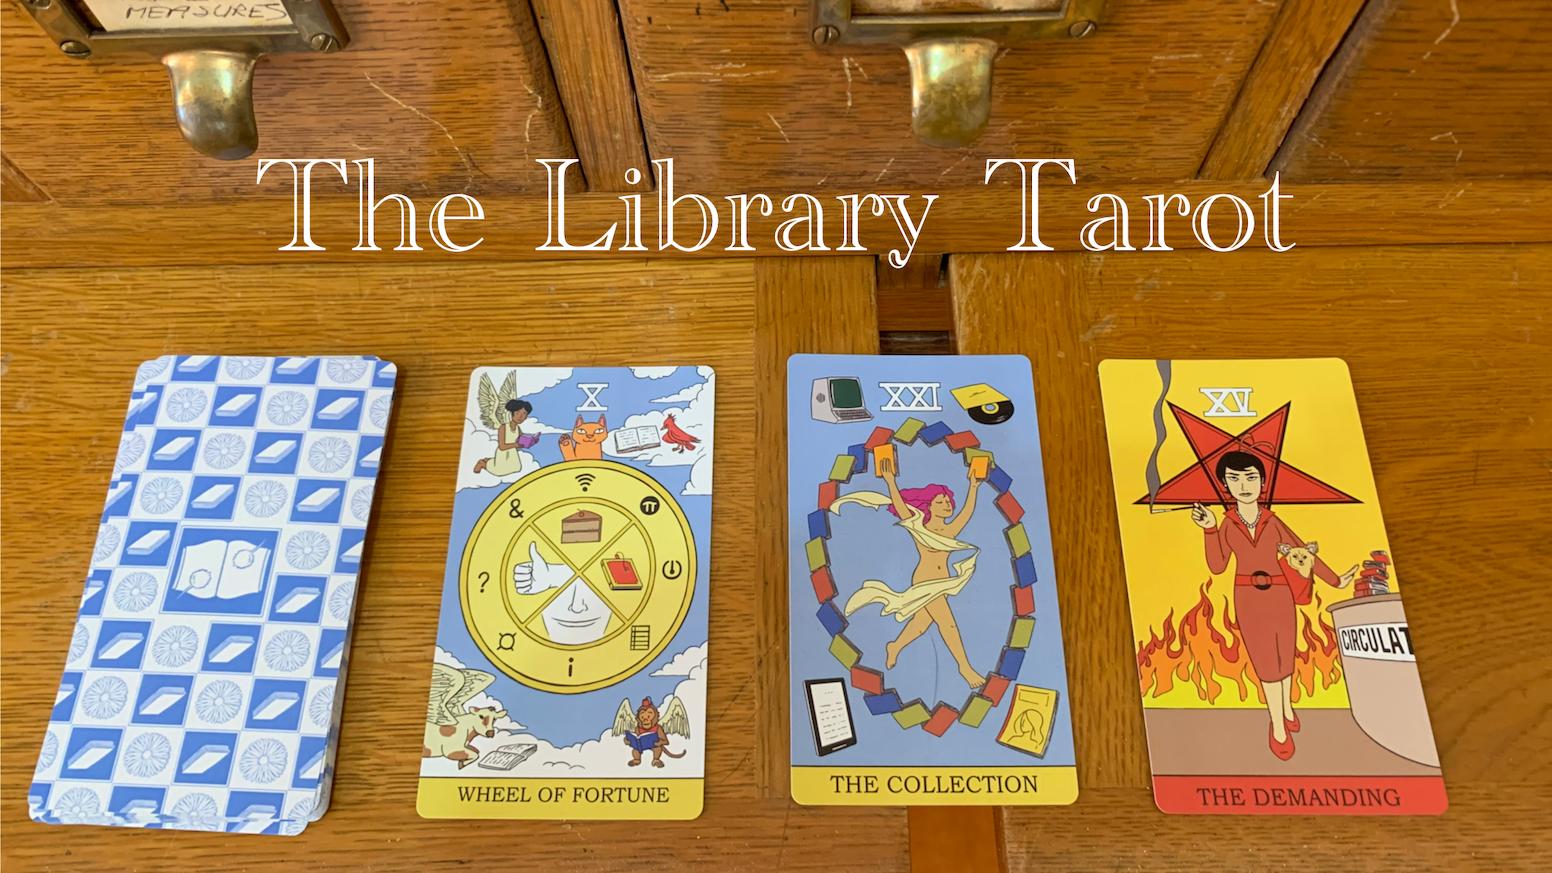 A set of fun, library-themed Major Arcana cards based on the Rider-Waite-Smith Tarot Deck.